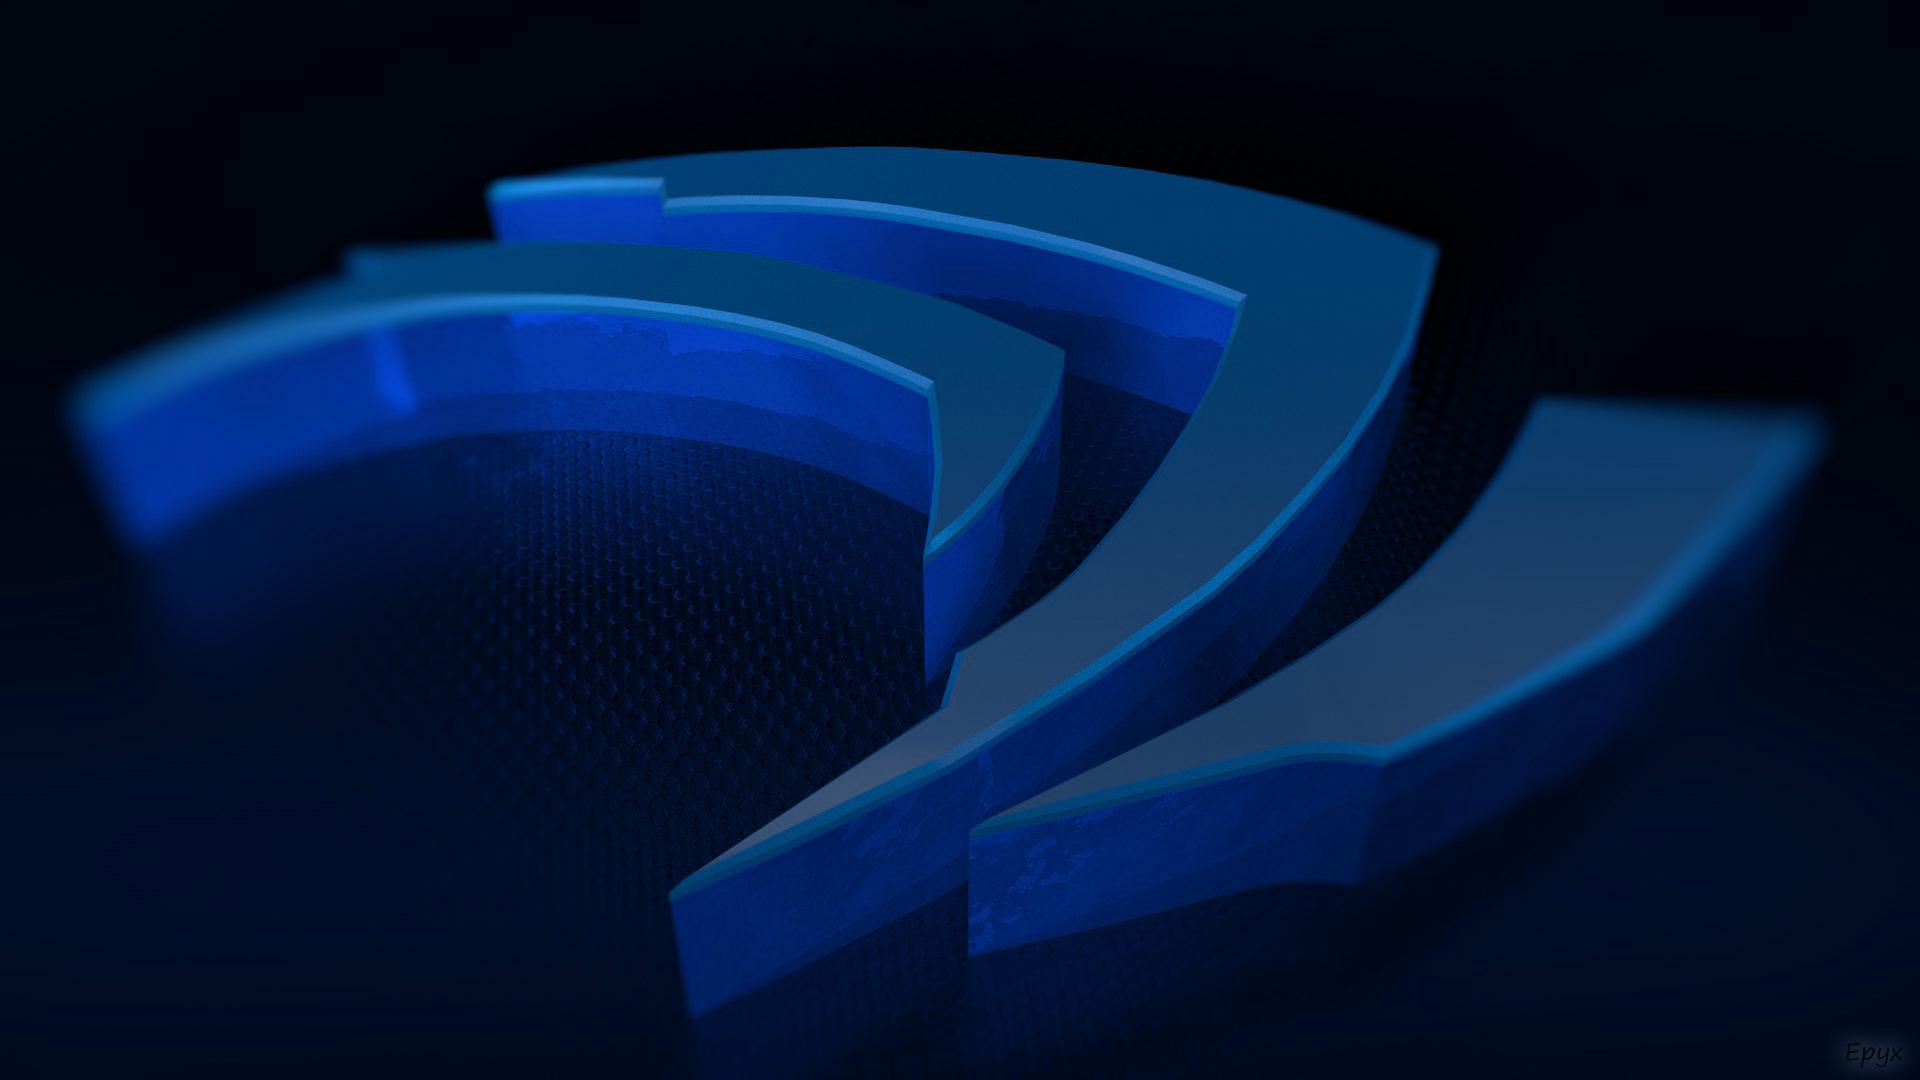 1920x1080px nvidia wallpapers wallpapersafari - 1920x1080 wallpaper nvidia ...